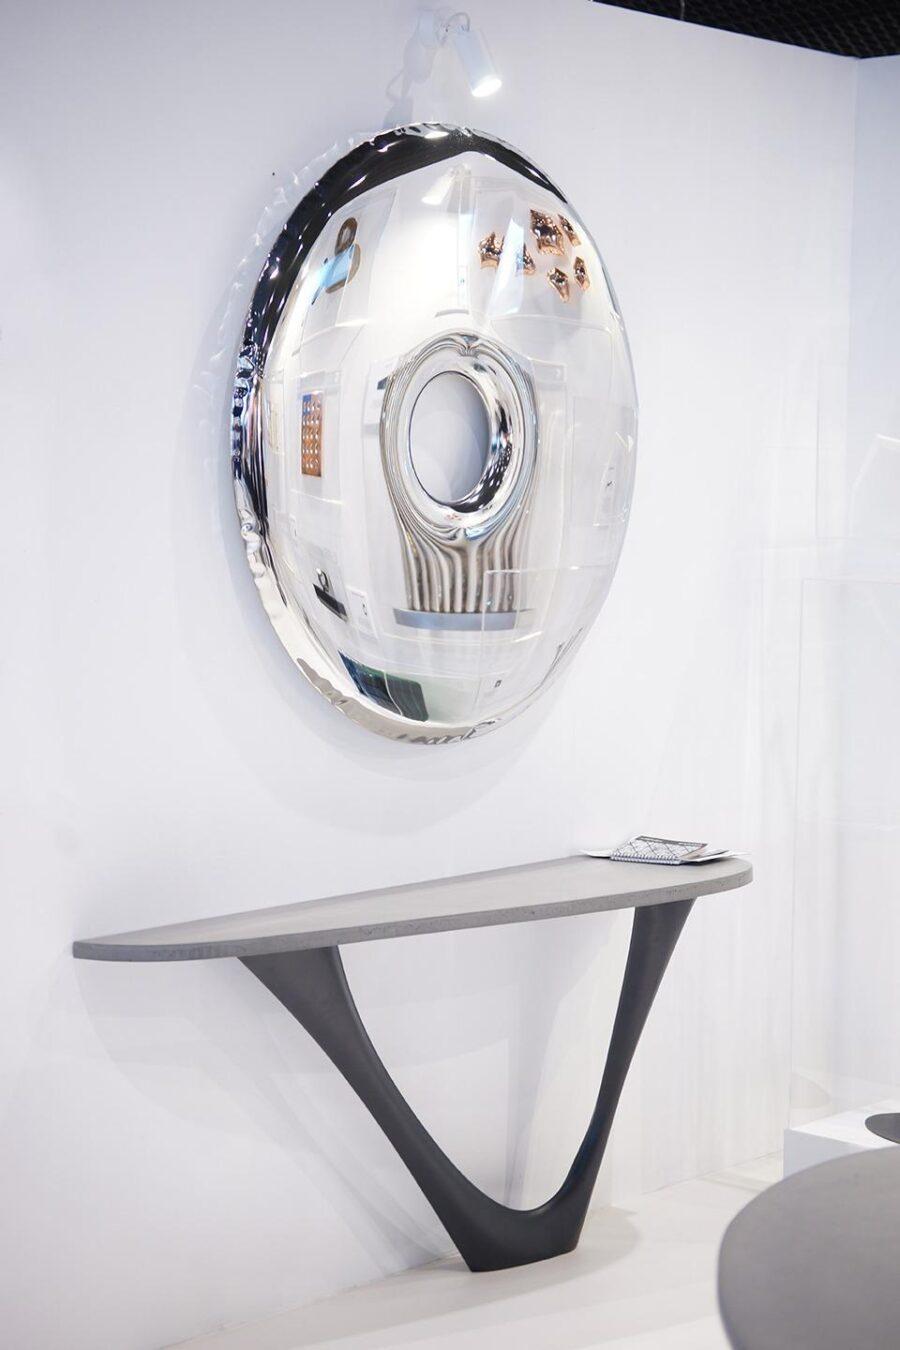 rondo mirror inox g-console